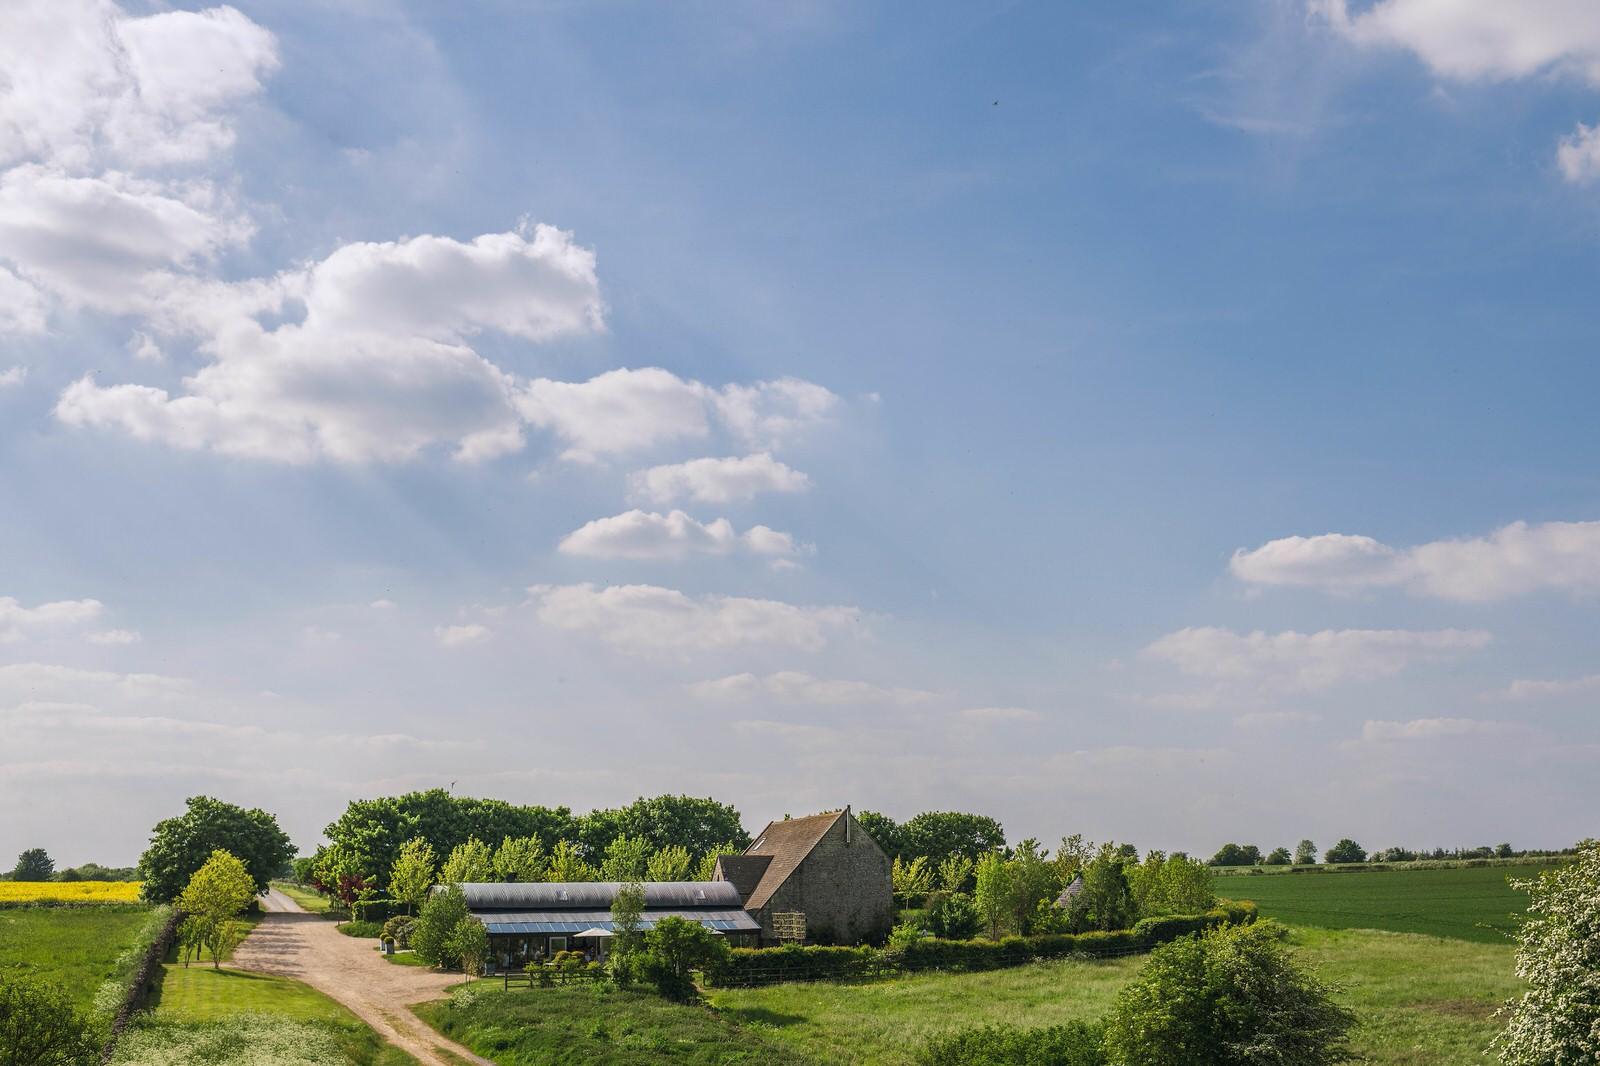 Stone Barn - Dan Morris Photography - summer 2018 - Debbie & Alex-432 (2)stone+barn+cotswold+wedding+venue.jpg